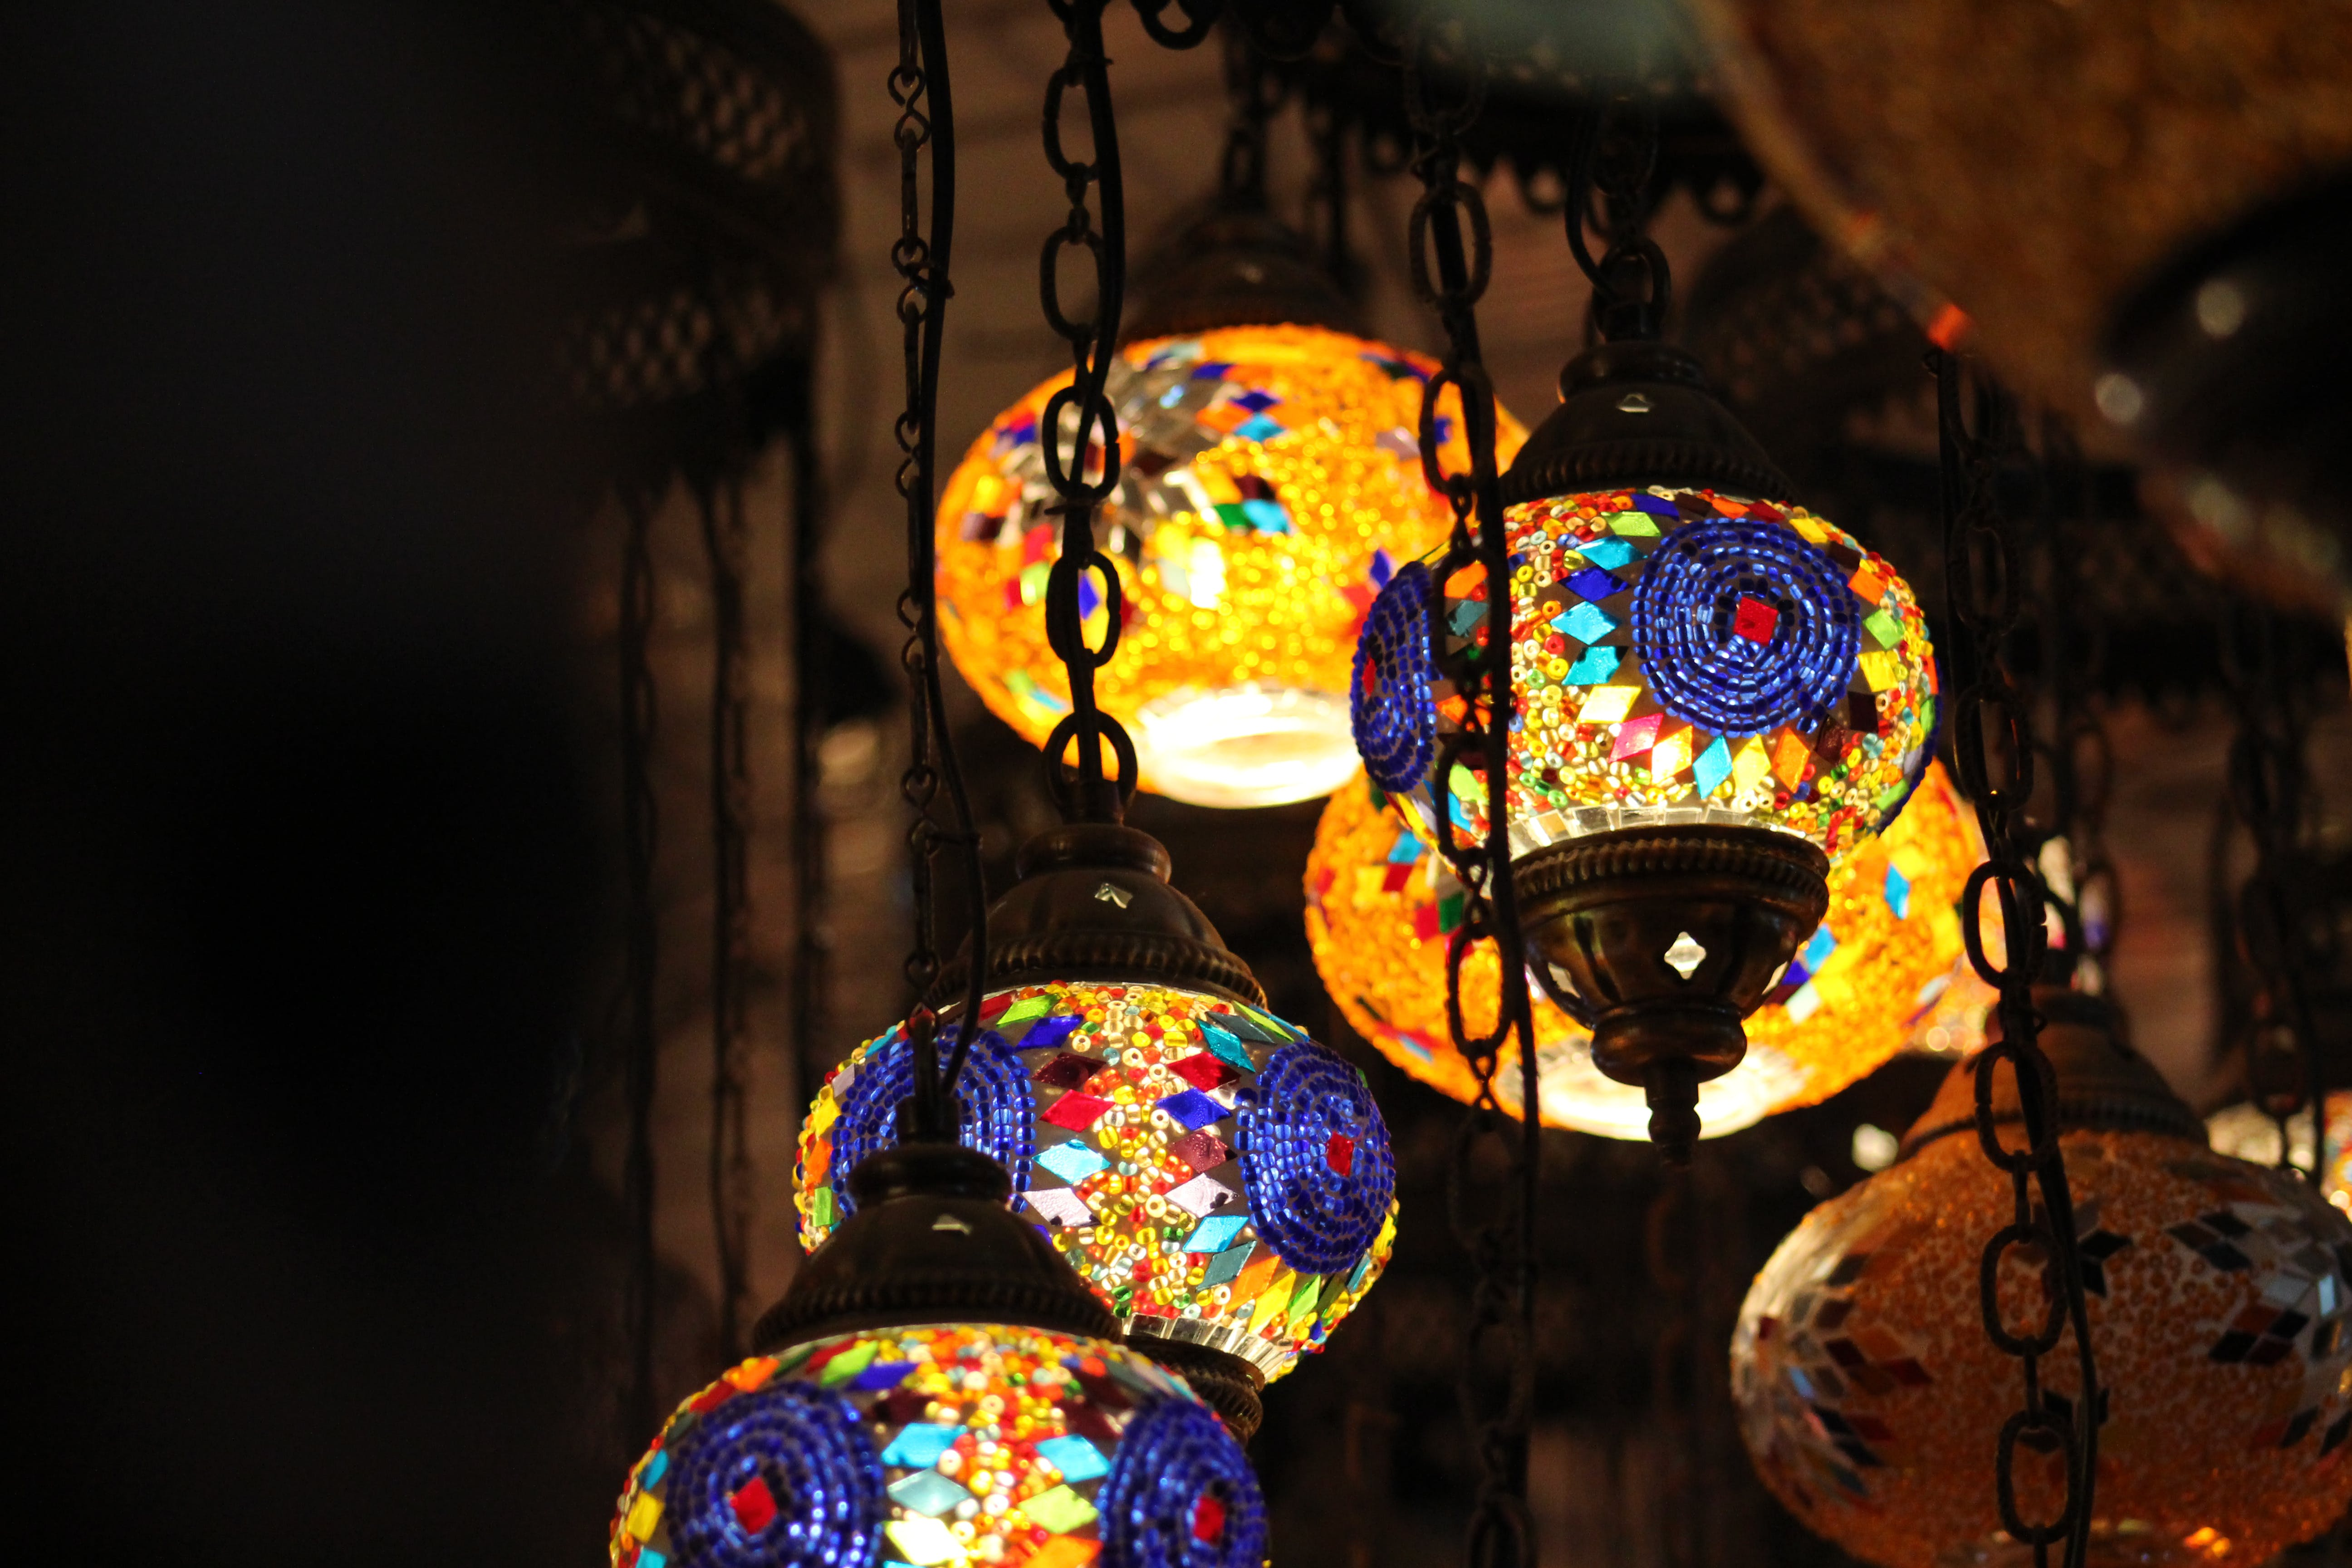 Brown Pendant Lamp Turn on